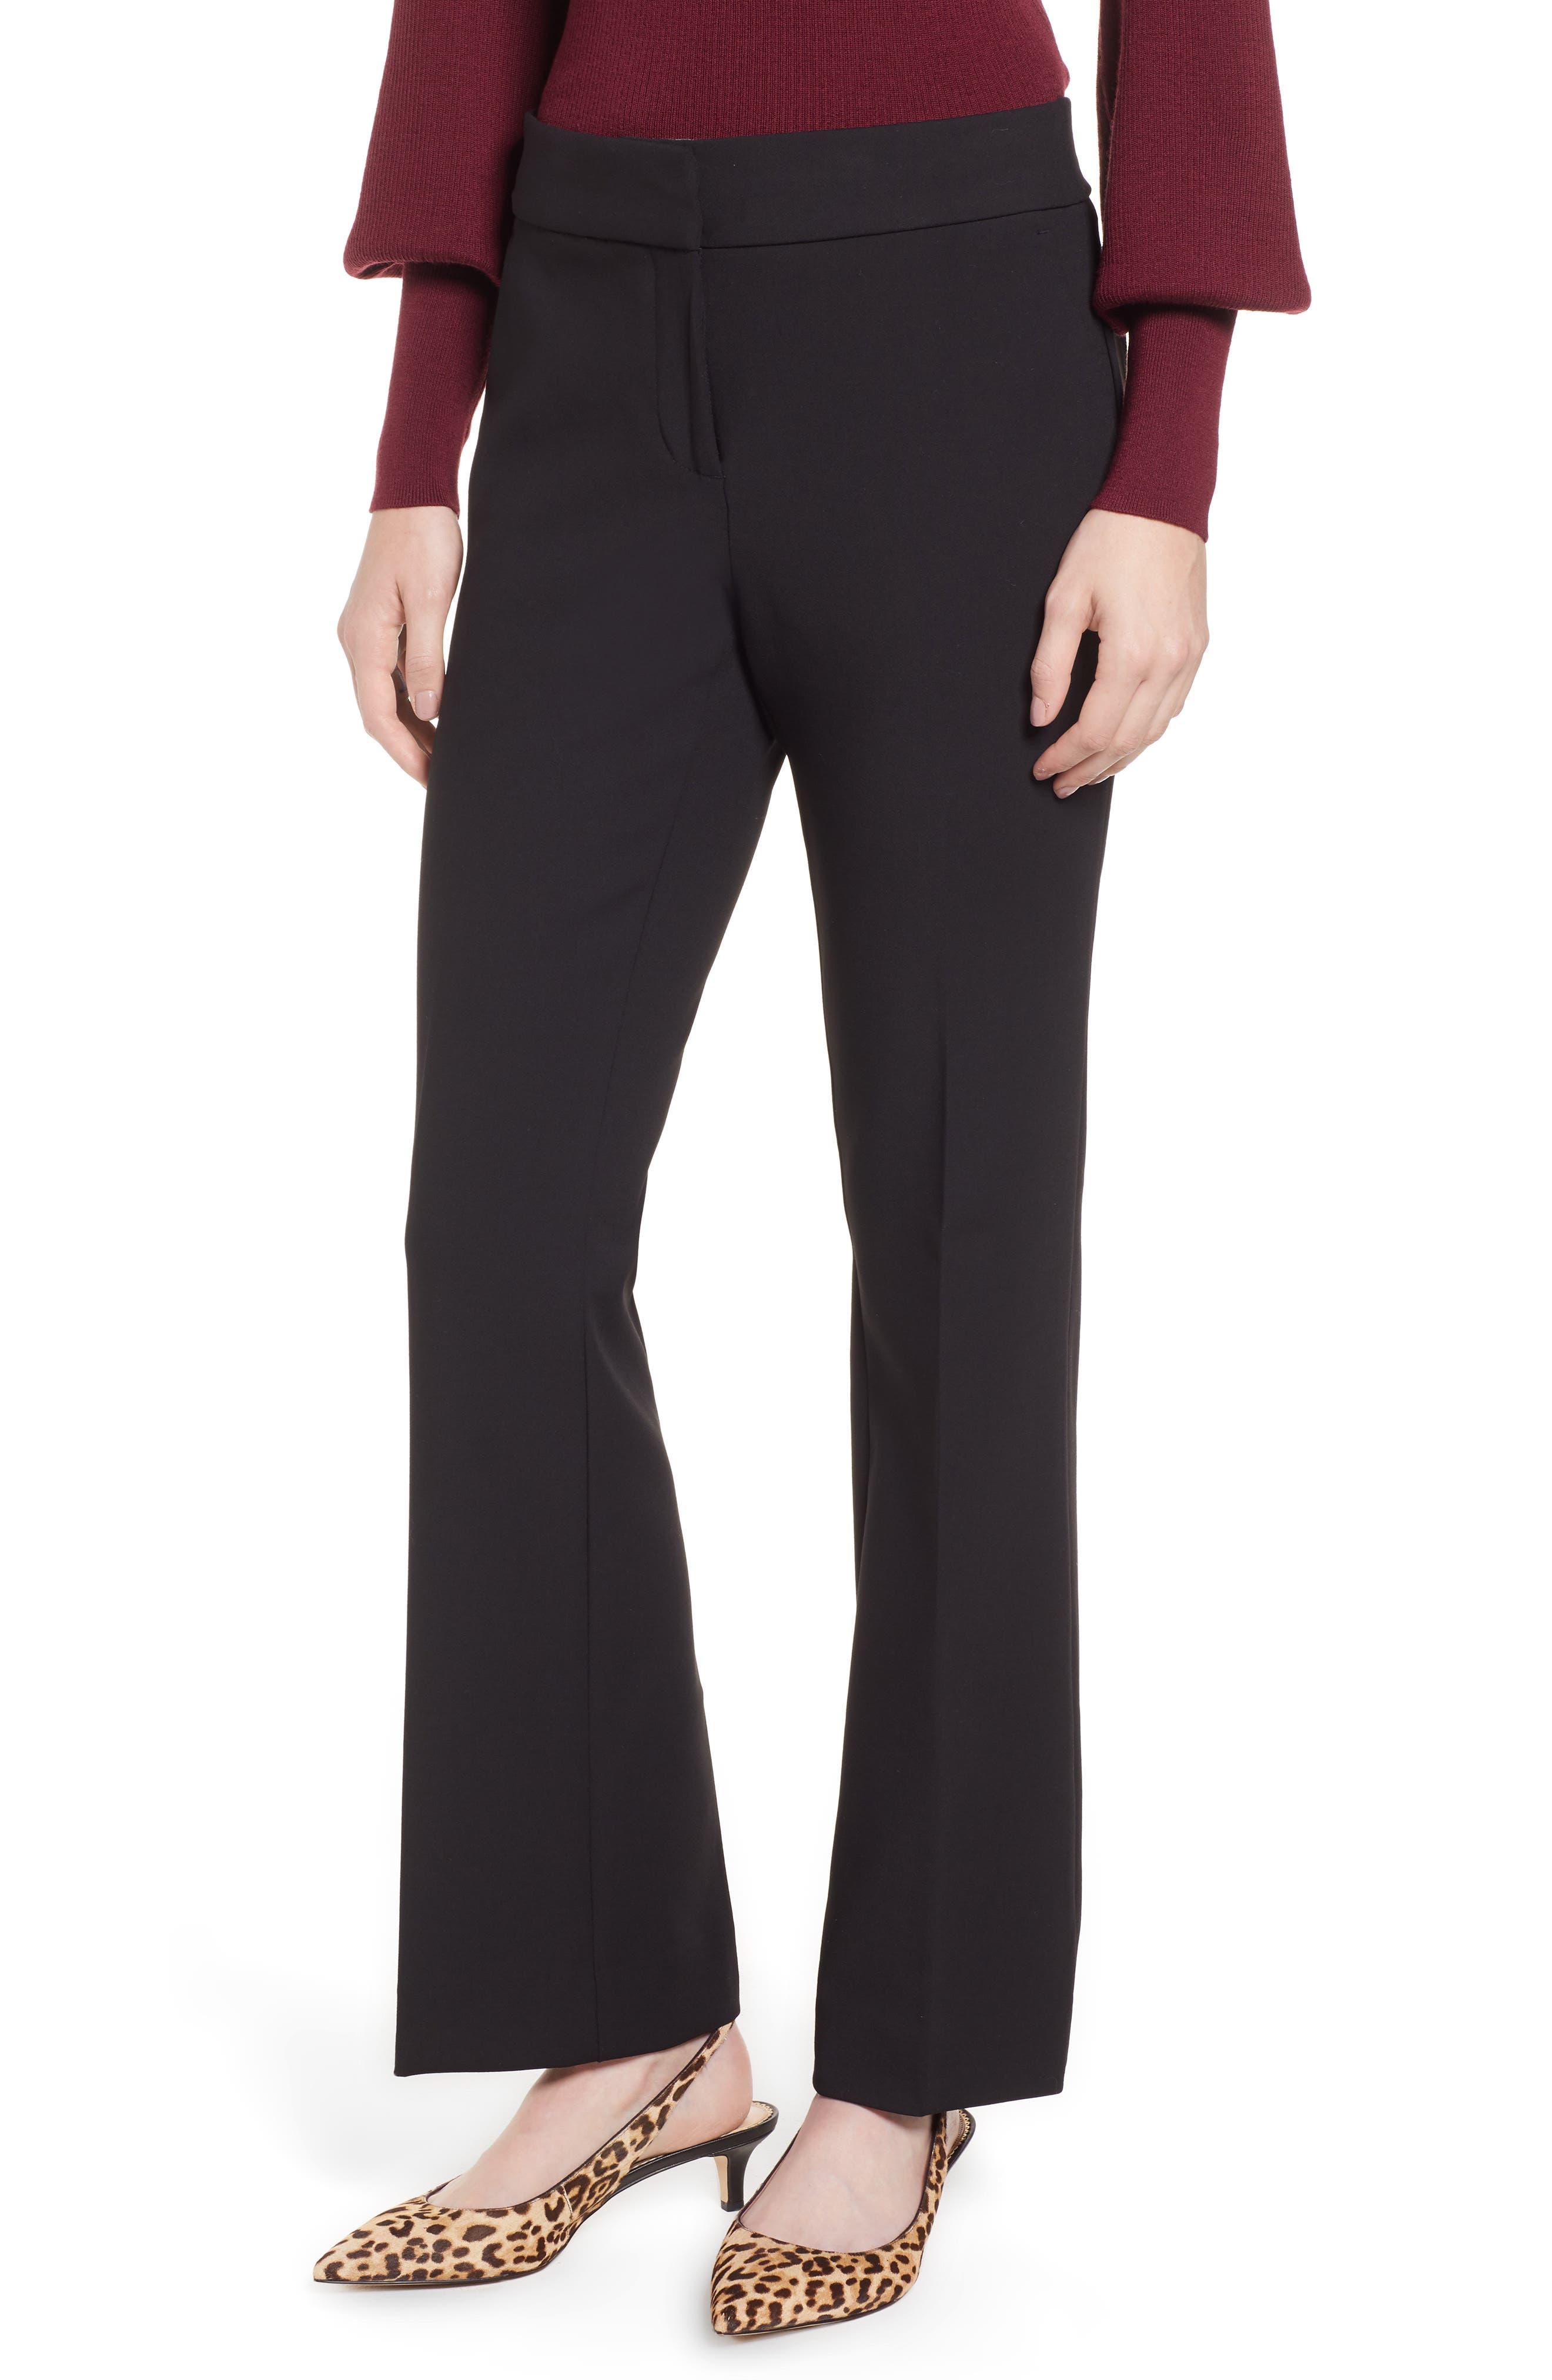 Edie Full Length Trouser in Four-Season Stretch,                             Main thumbnail 1, color,                             001